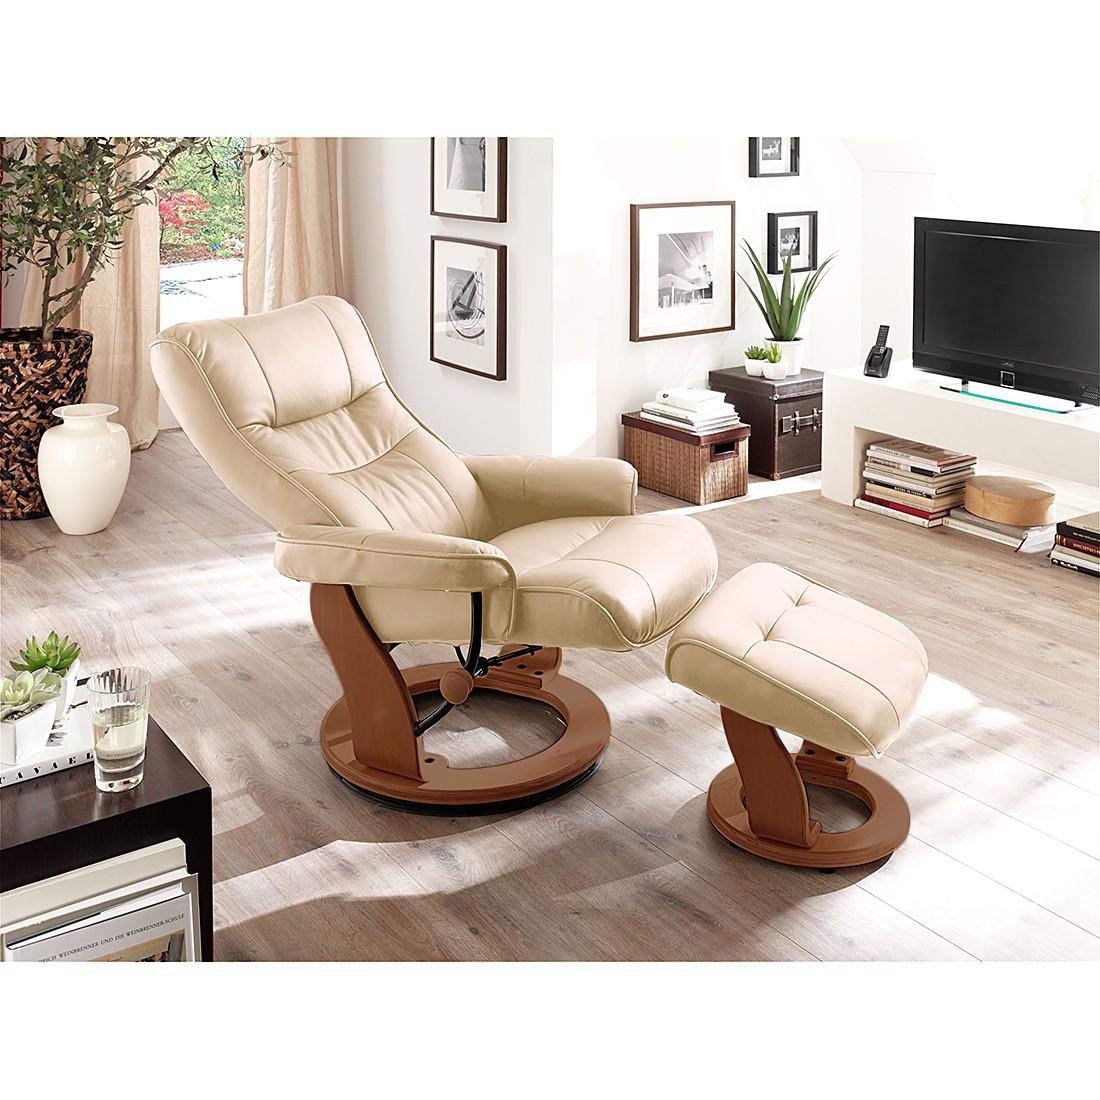 relaxsessel westerwald mit hocker sessel fernsehsessel relaxliege ruhesessel ebay. Black Bedroom Furniture Sets. Home Design Ideas